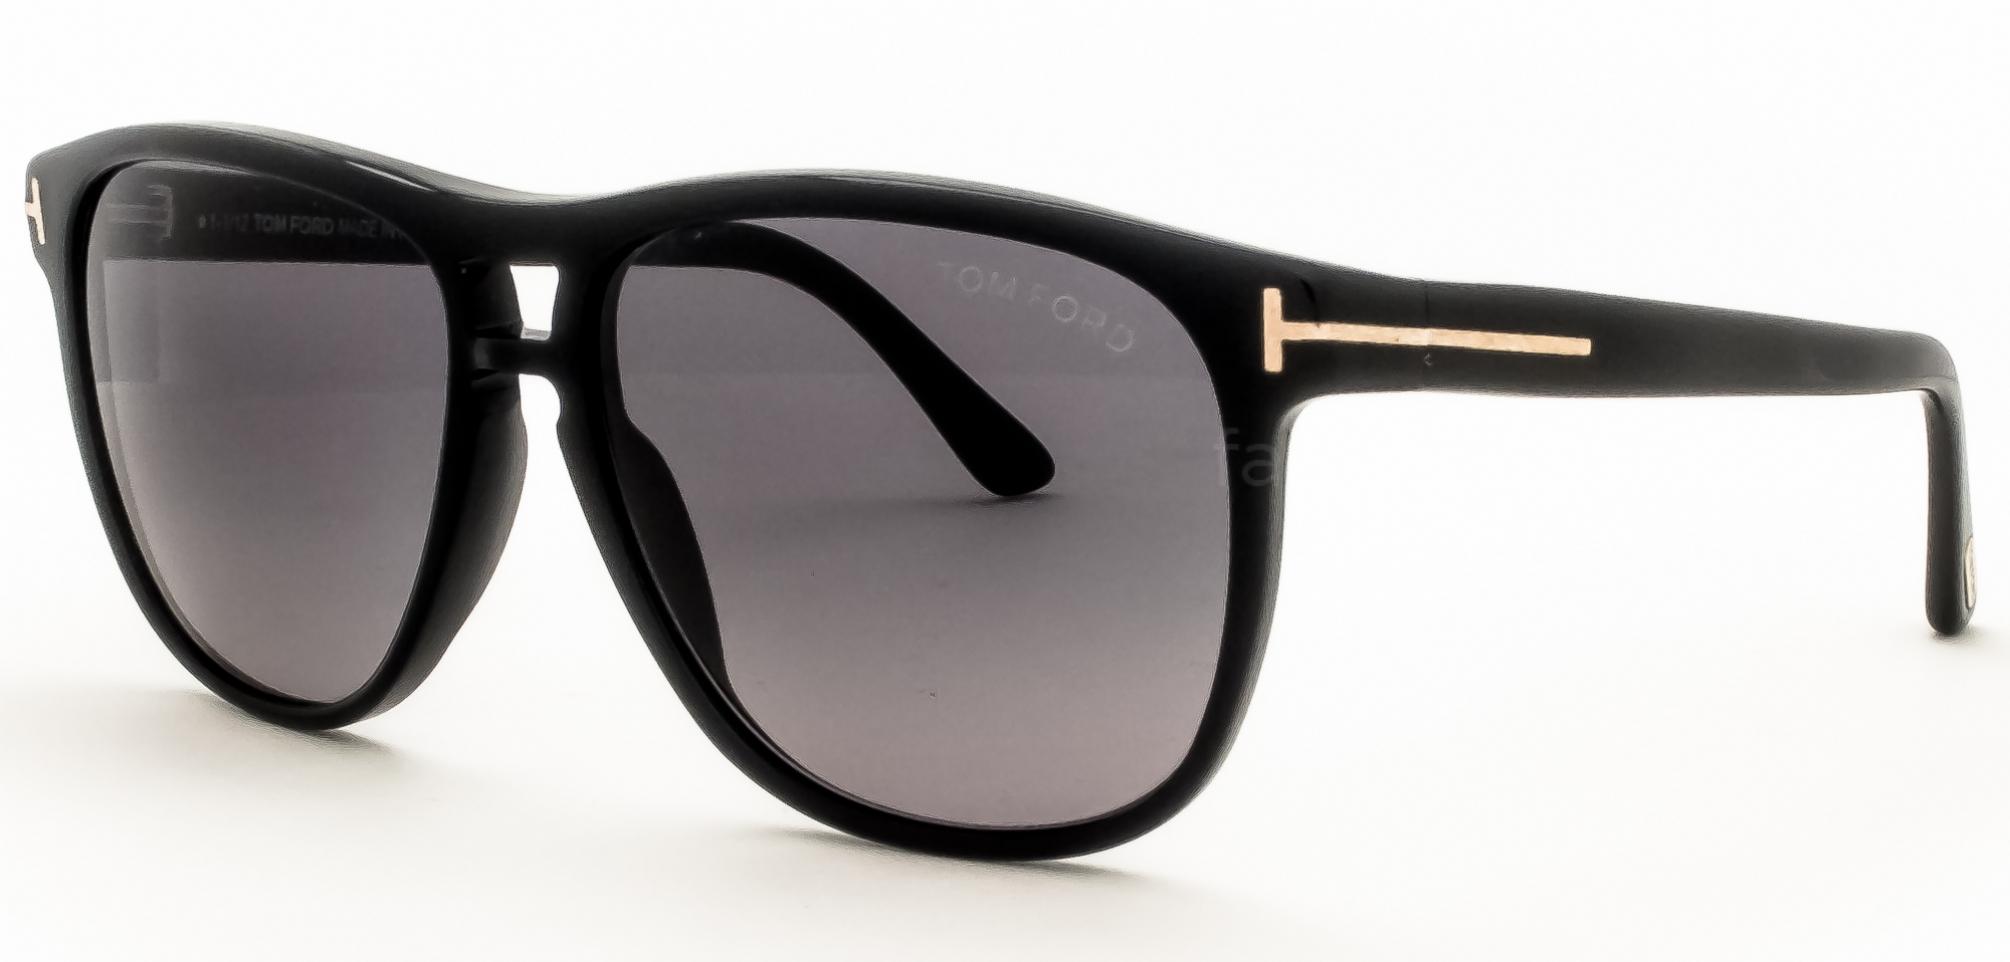 ec81368229 Buy Tom Ford Sunglasses directly from eyeglassesdepot.com